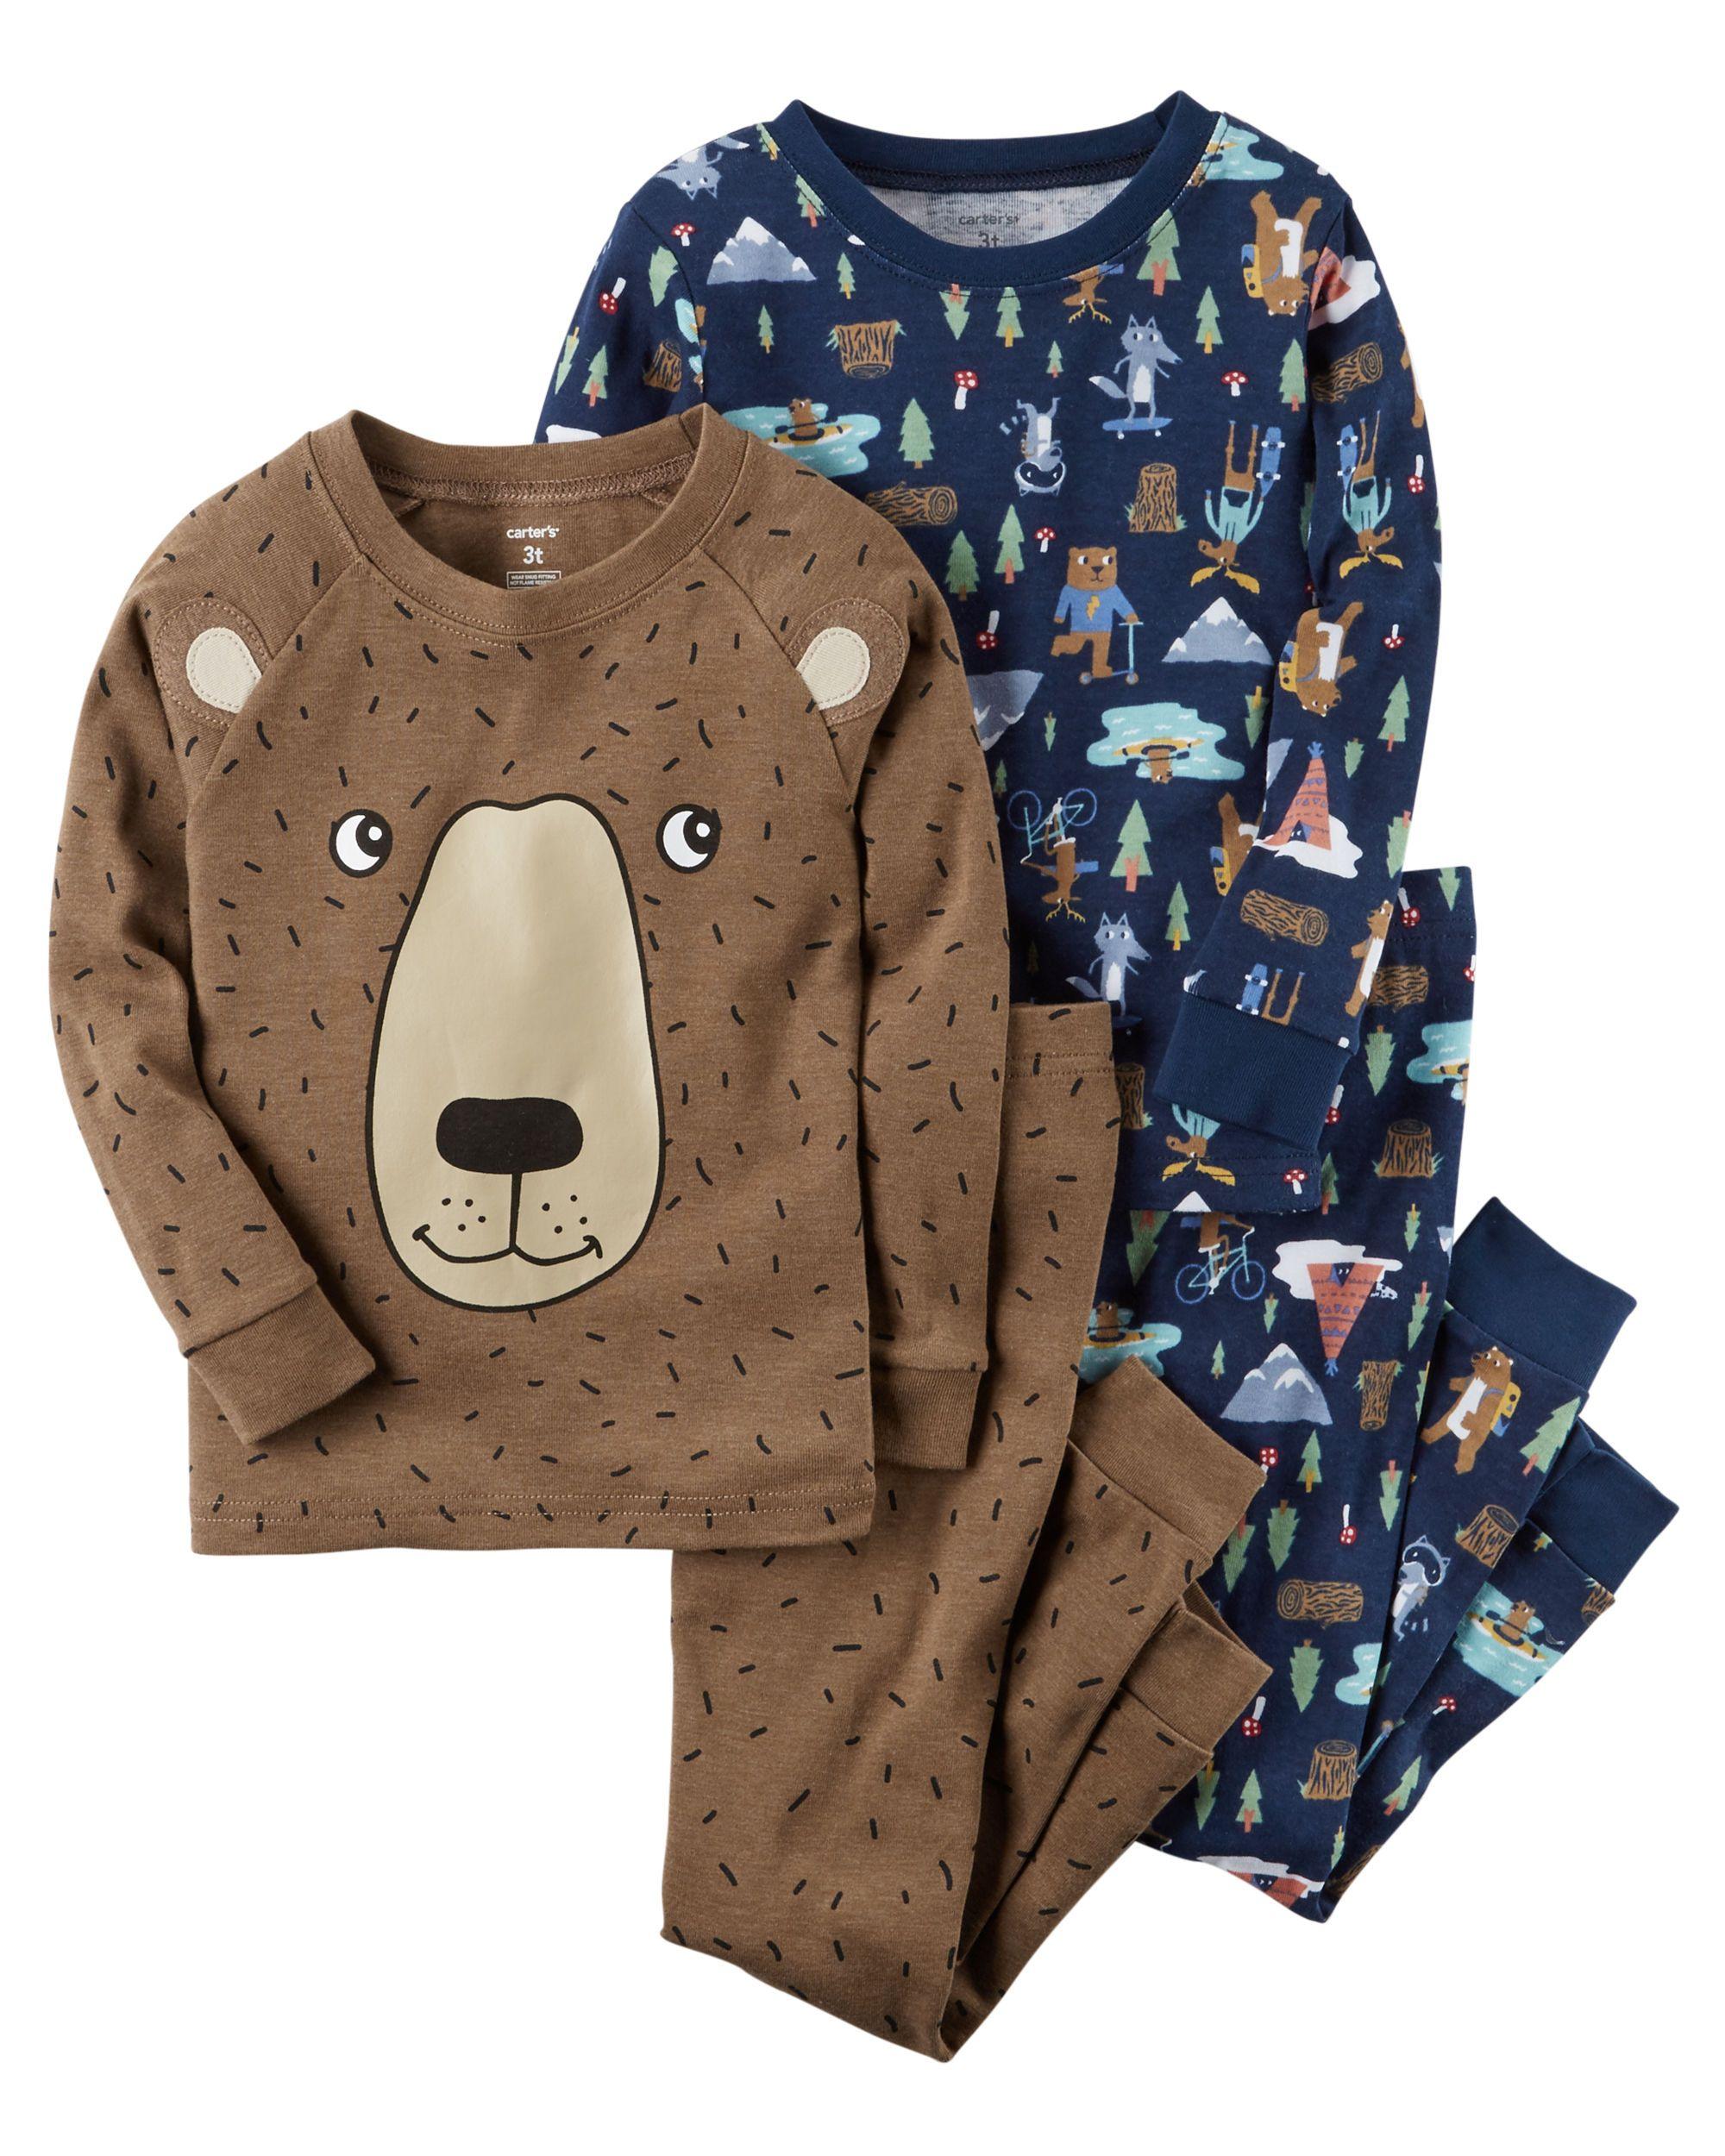 983737cca0d0 4-Piece Camping Snug Fit PJs